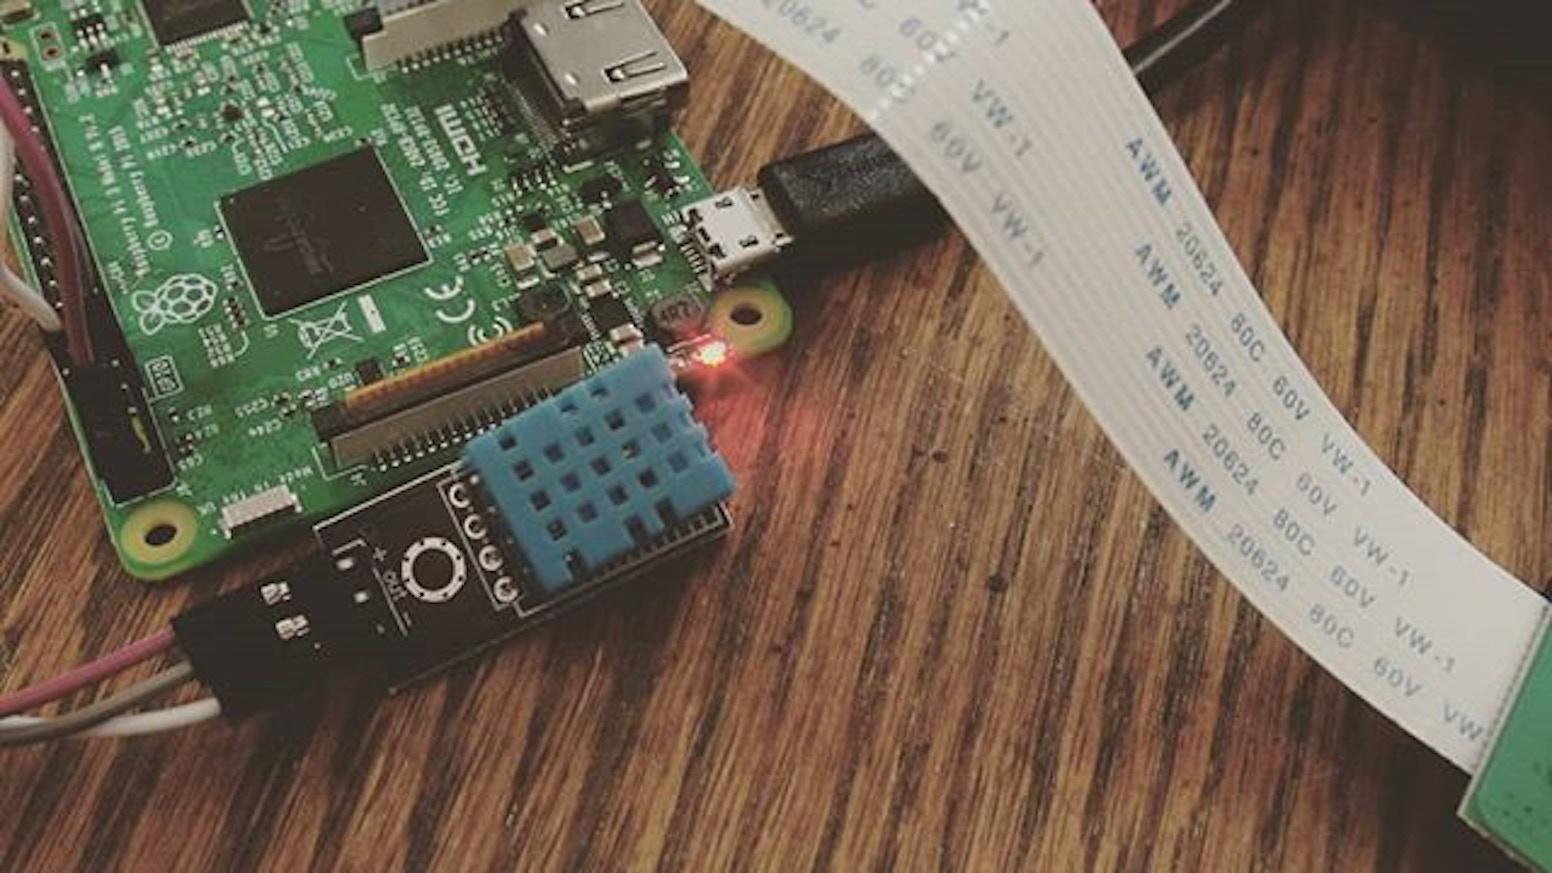 Raspberry Pi Cameras & Temperature Sensors: An IoT Guide by Robert